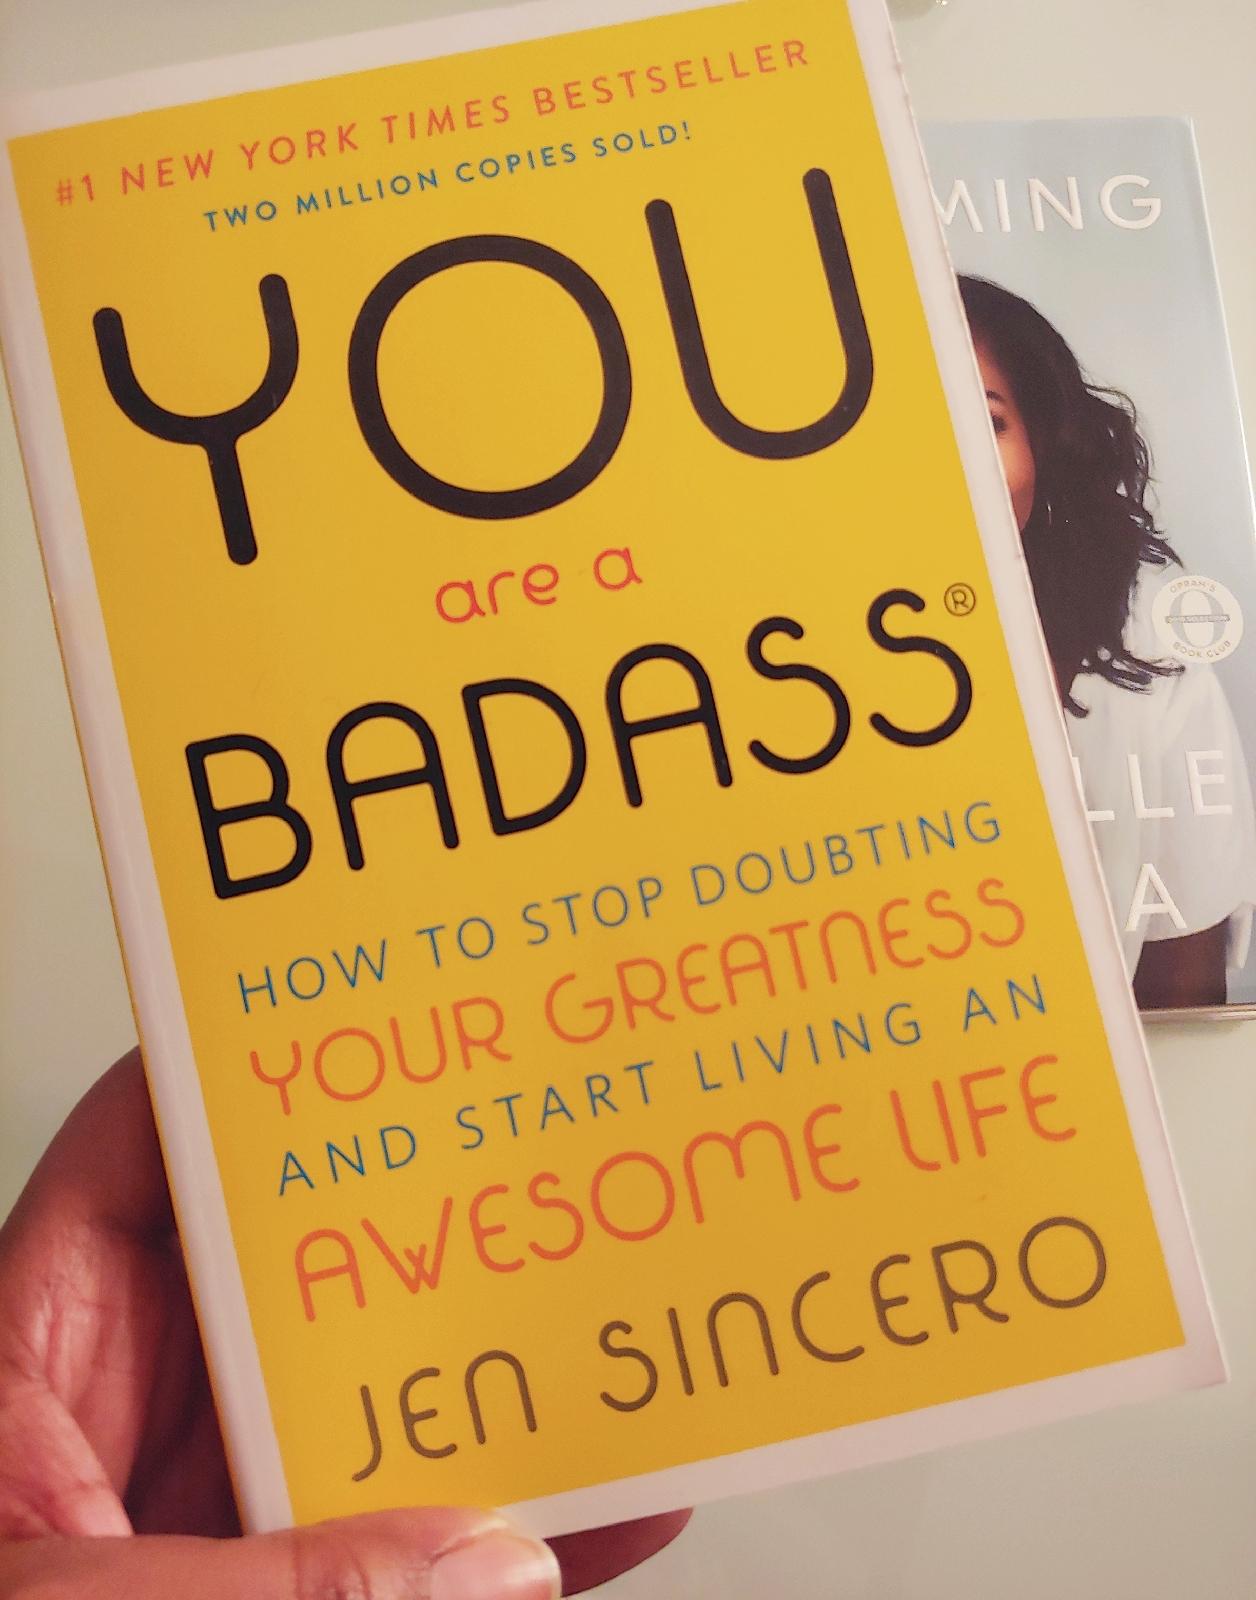 you are a badass jen sincero